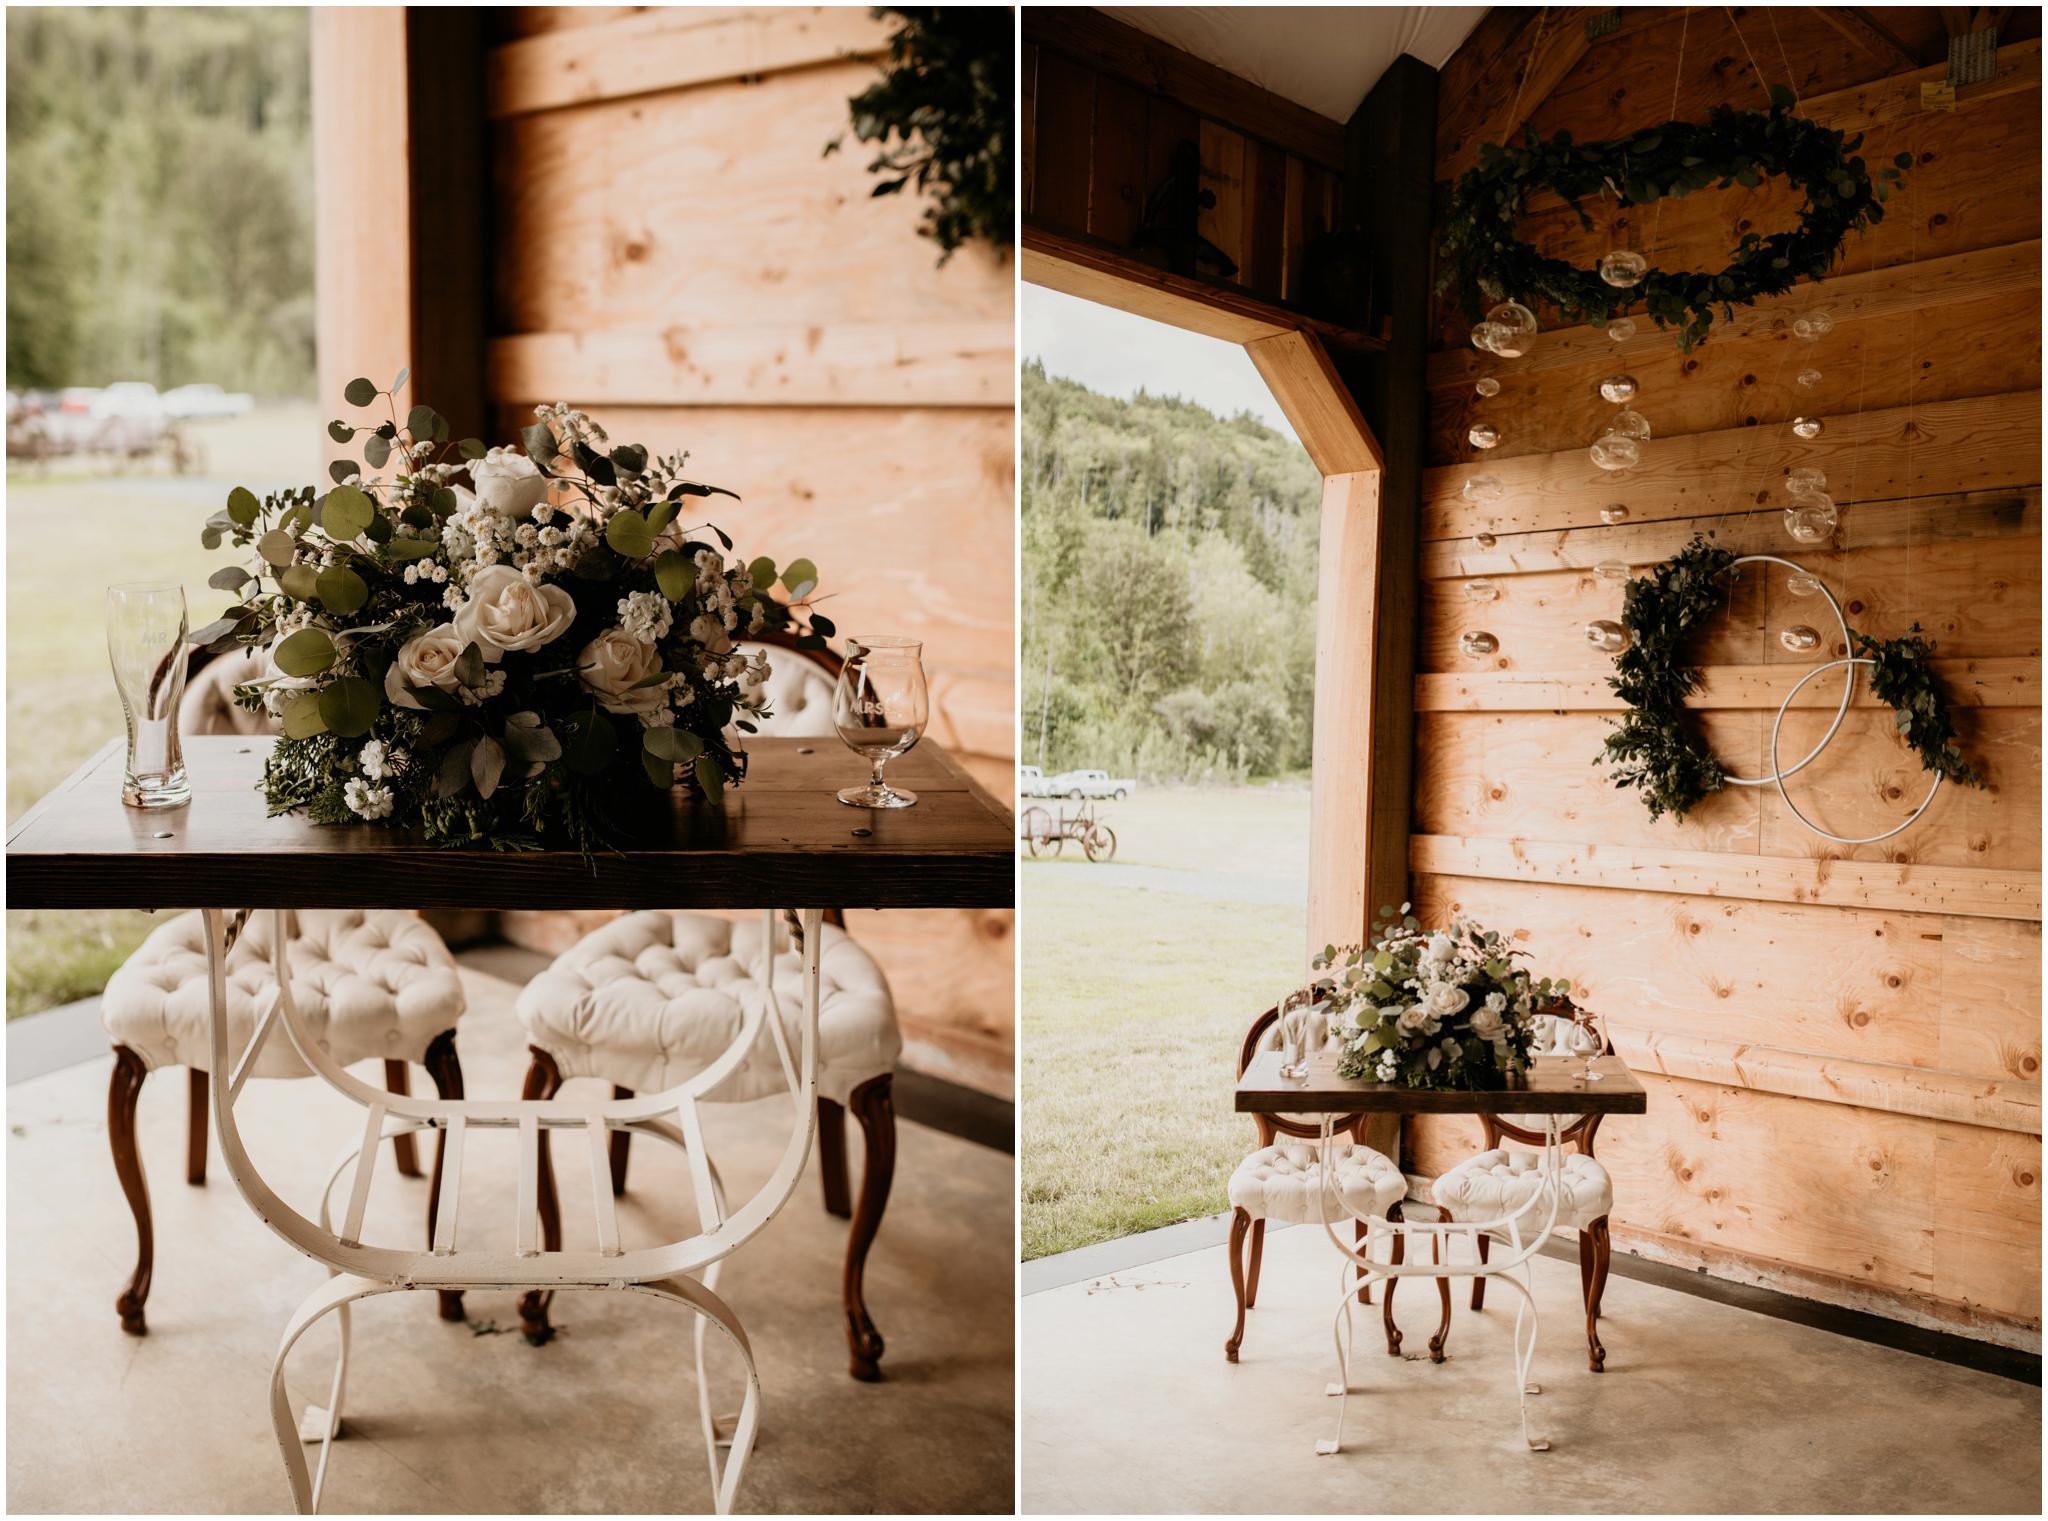 alex-and-matthew-three-cs-farm-venue-seattle-wedding-photographer-089.jpg